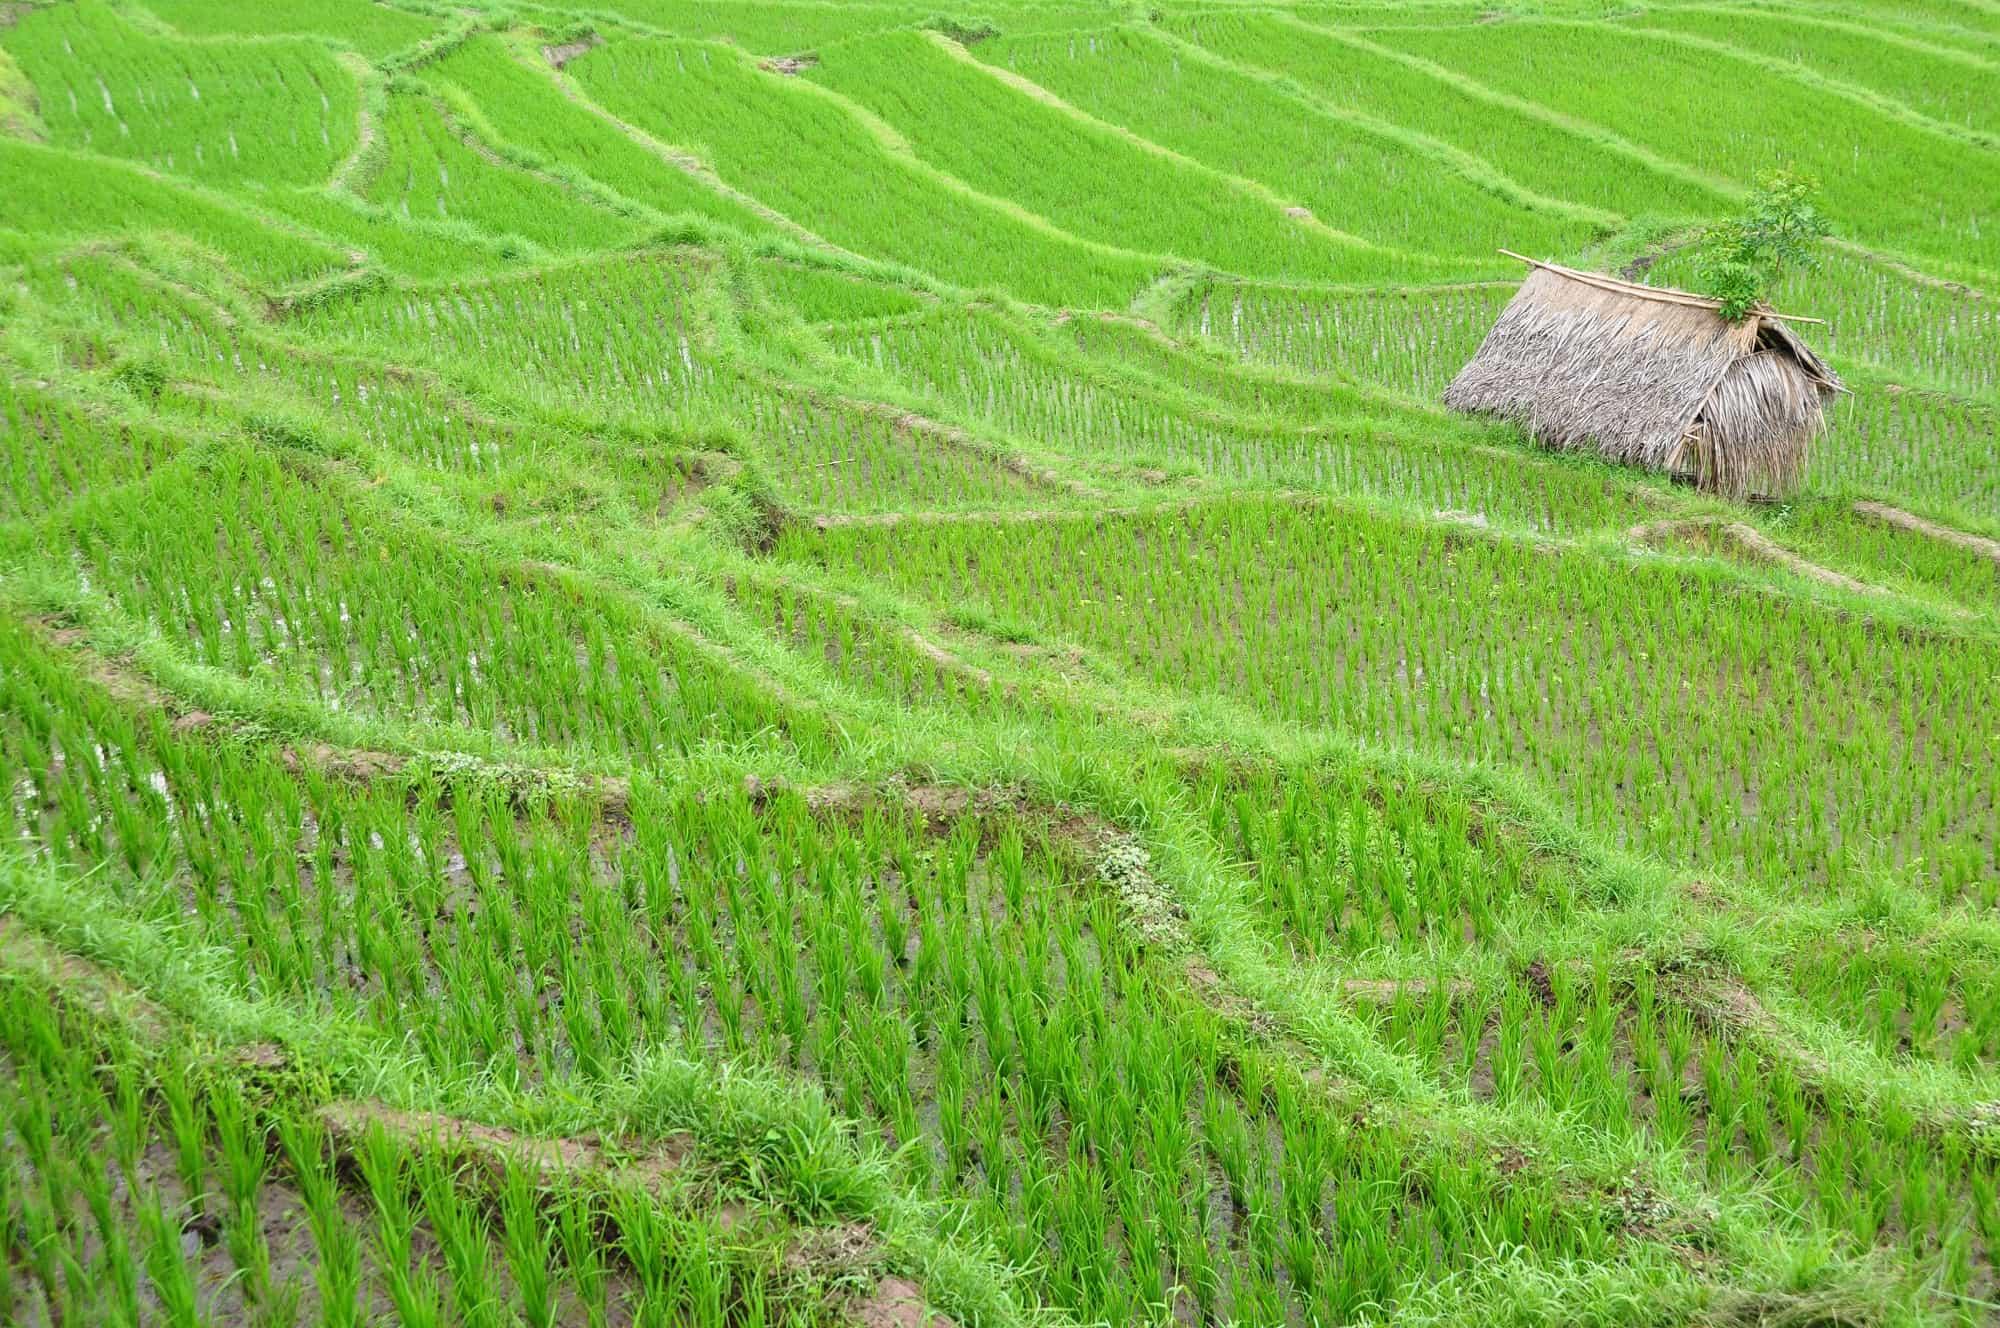 bali rizières en cascade maison